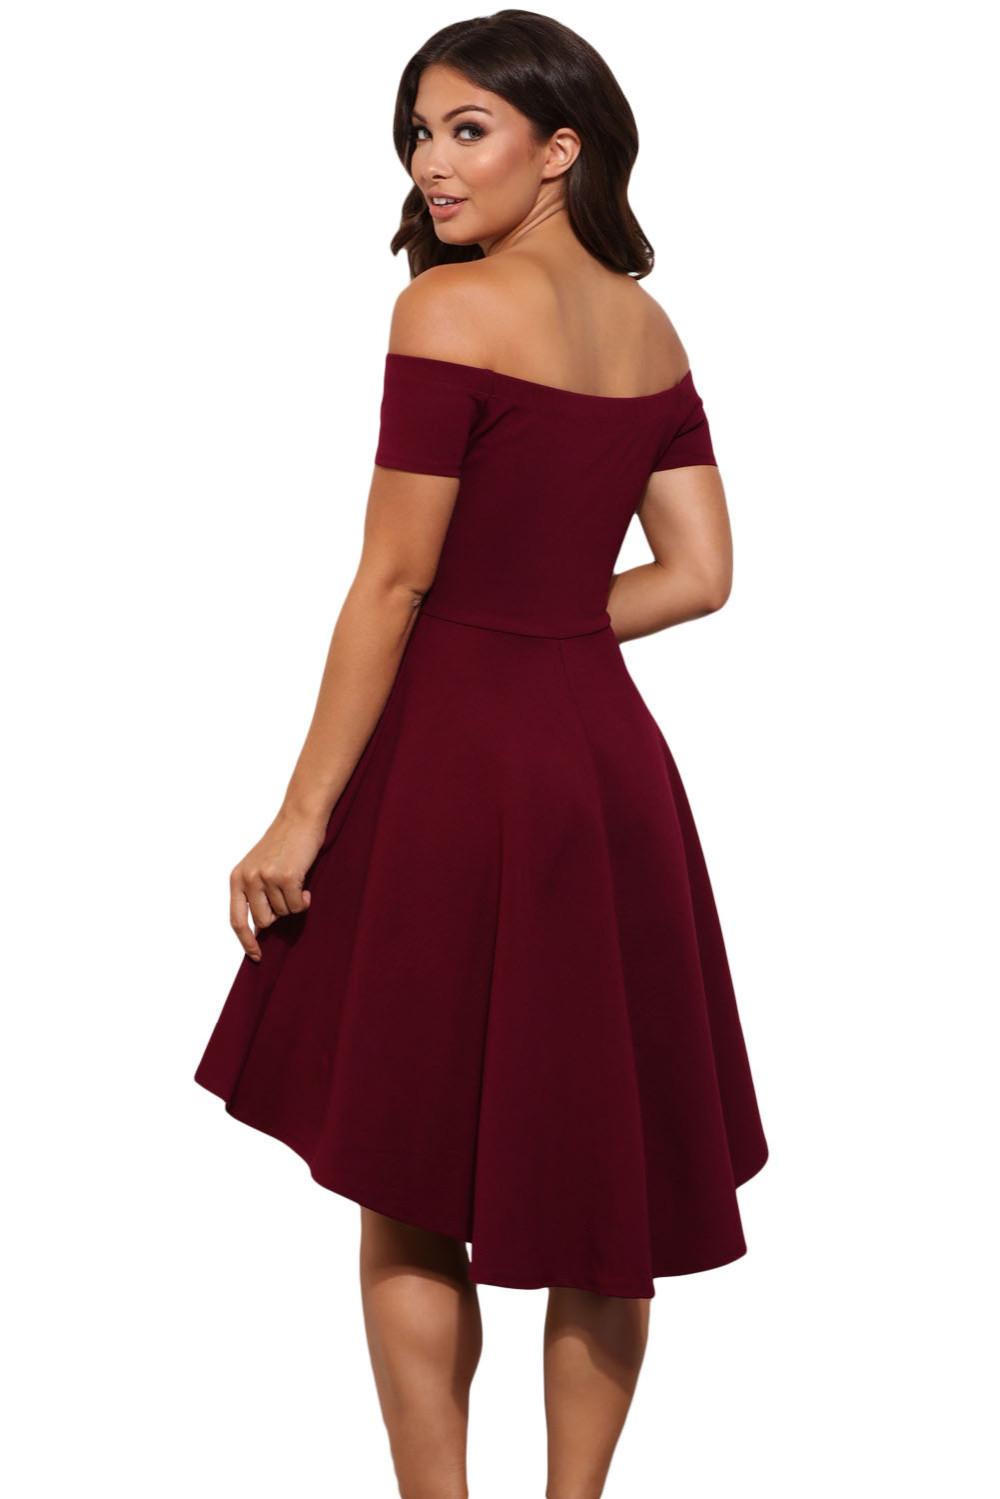 61346 Fall Burgundy High Low Skater Dress